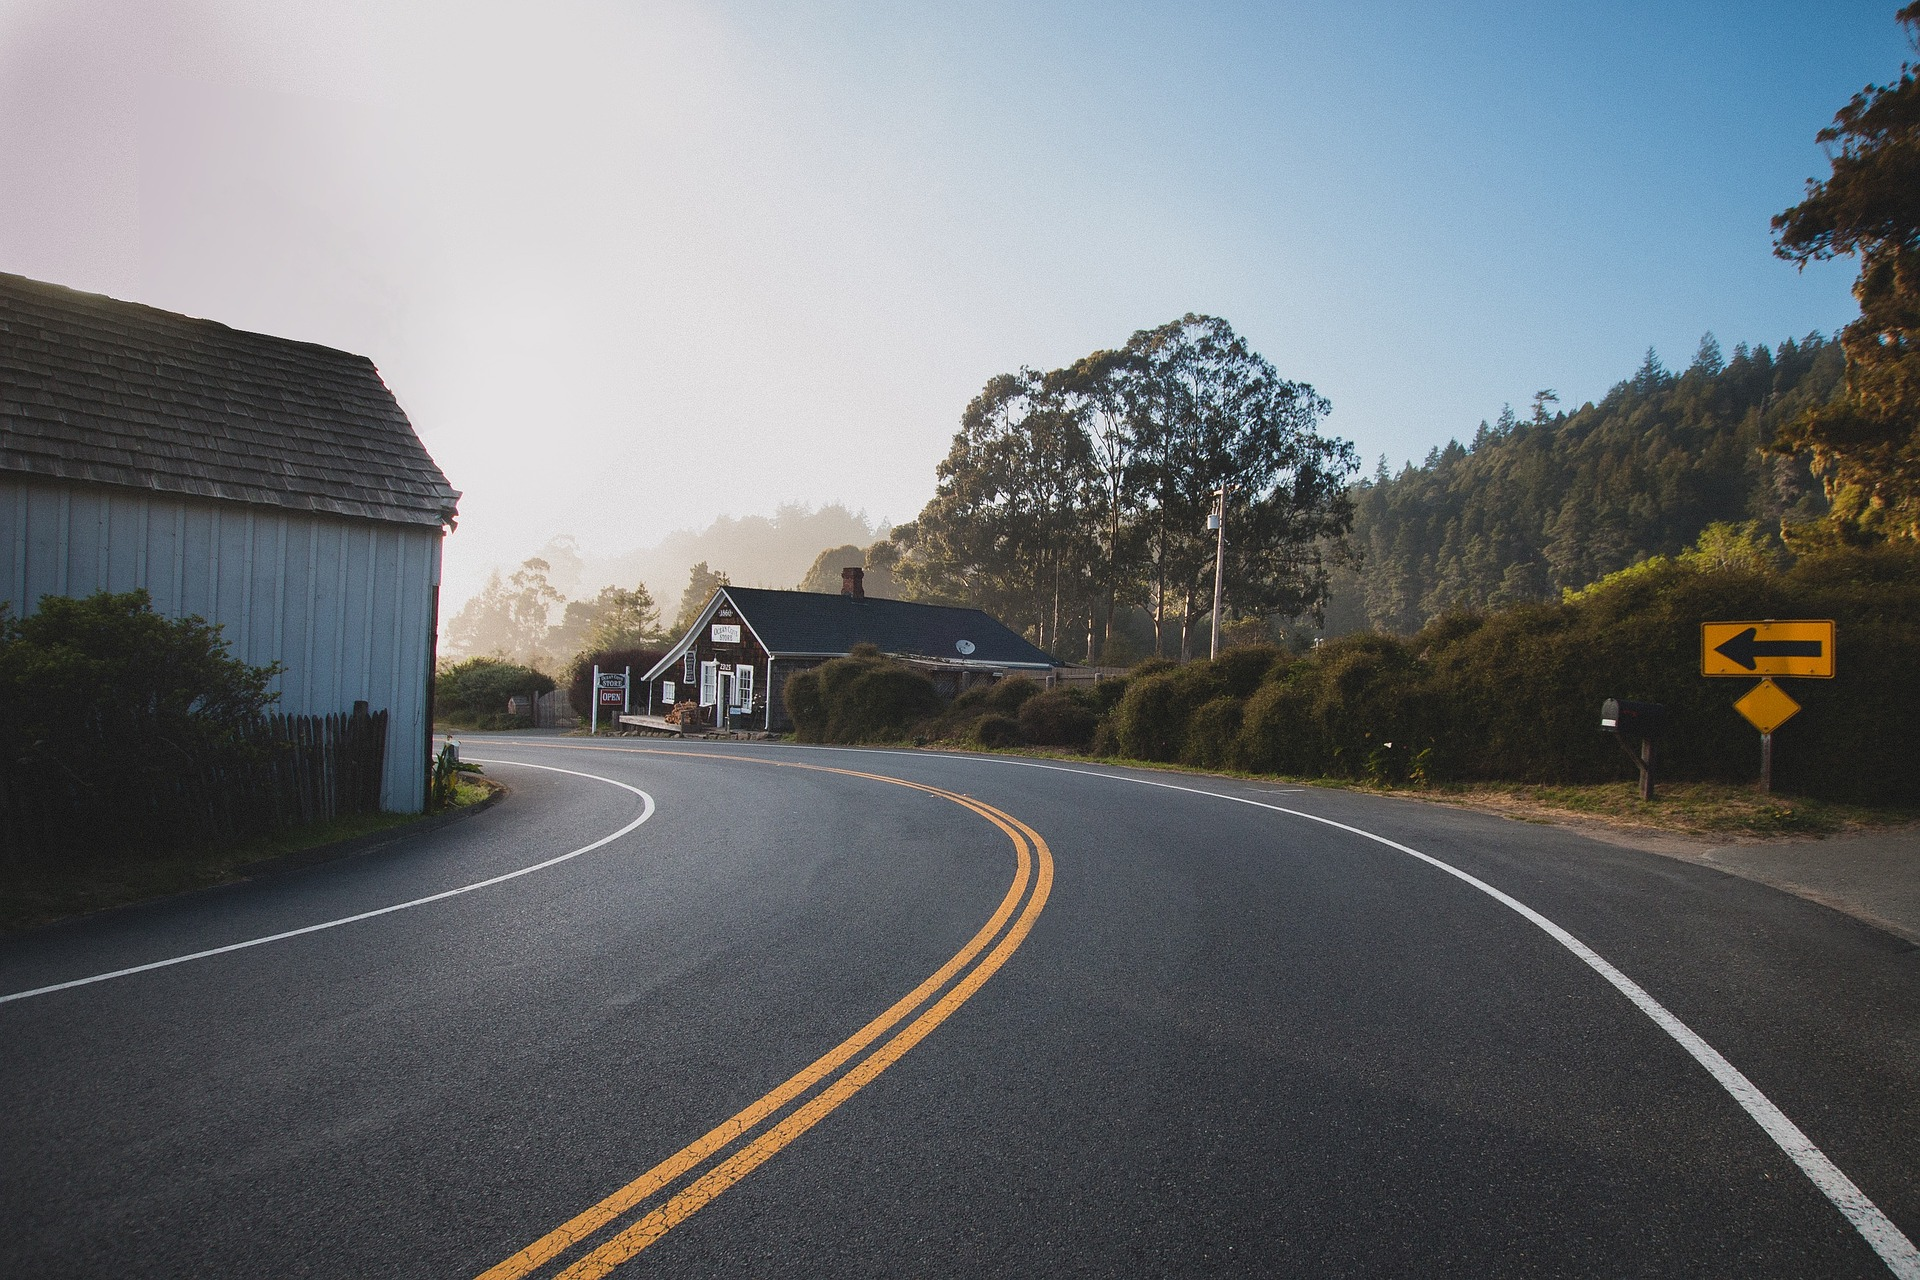 road-863126_1920